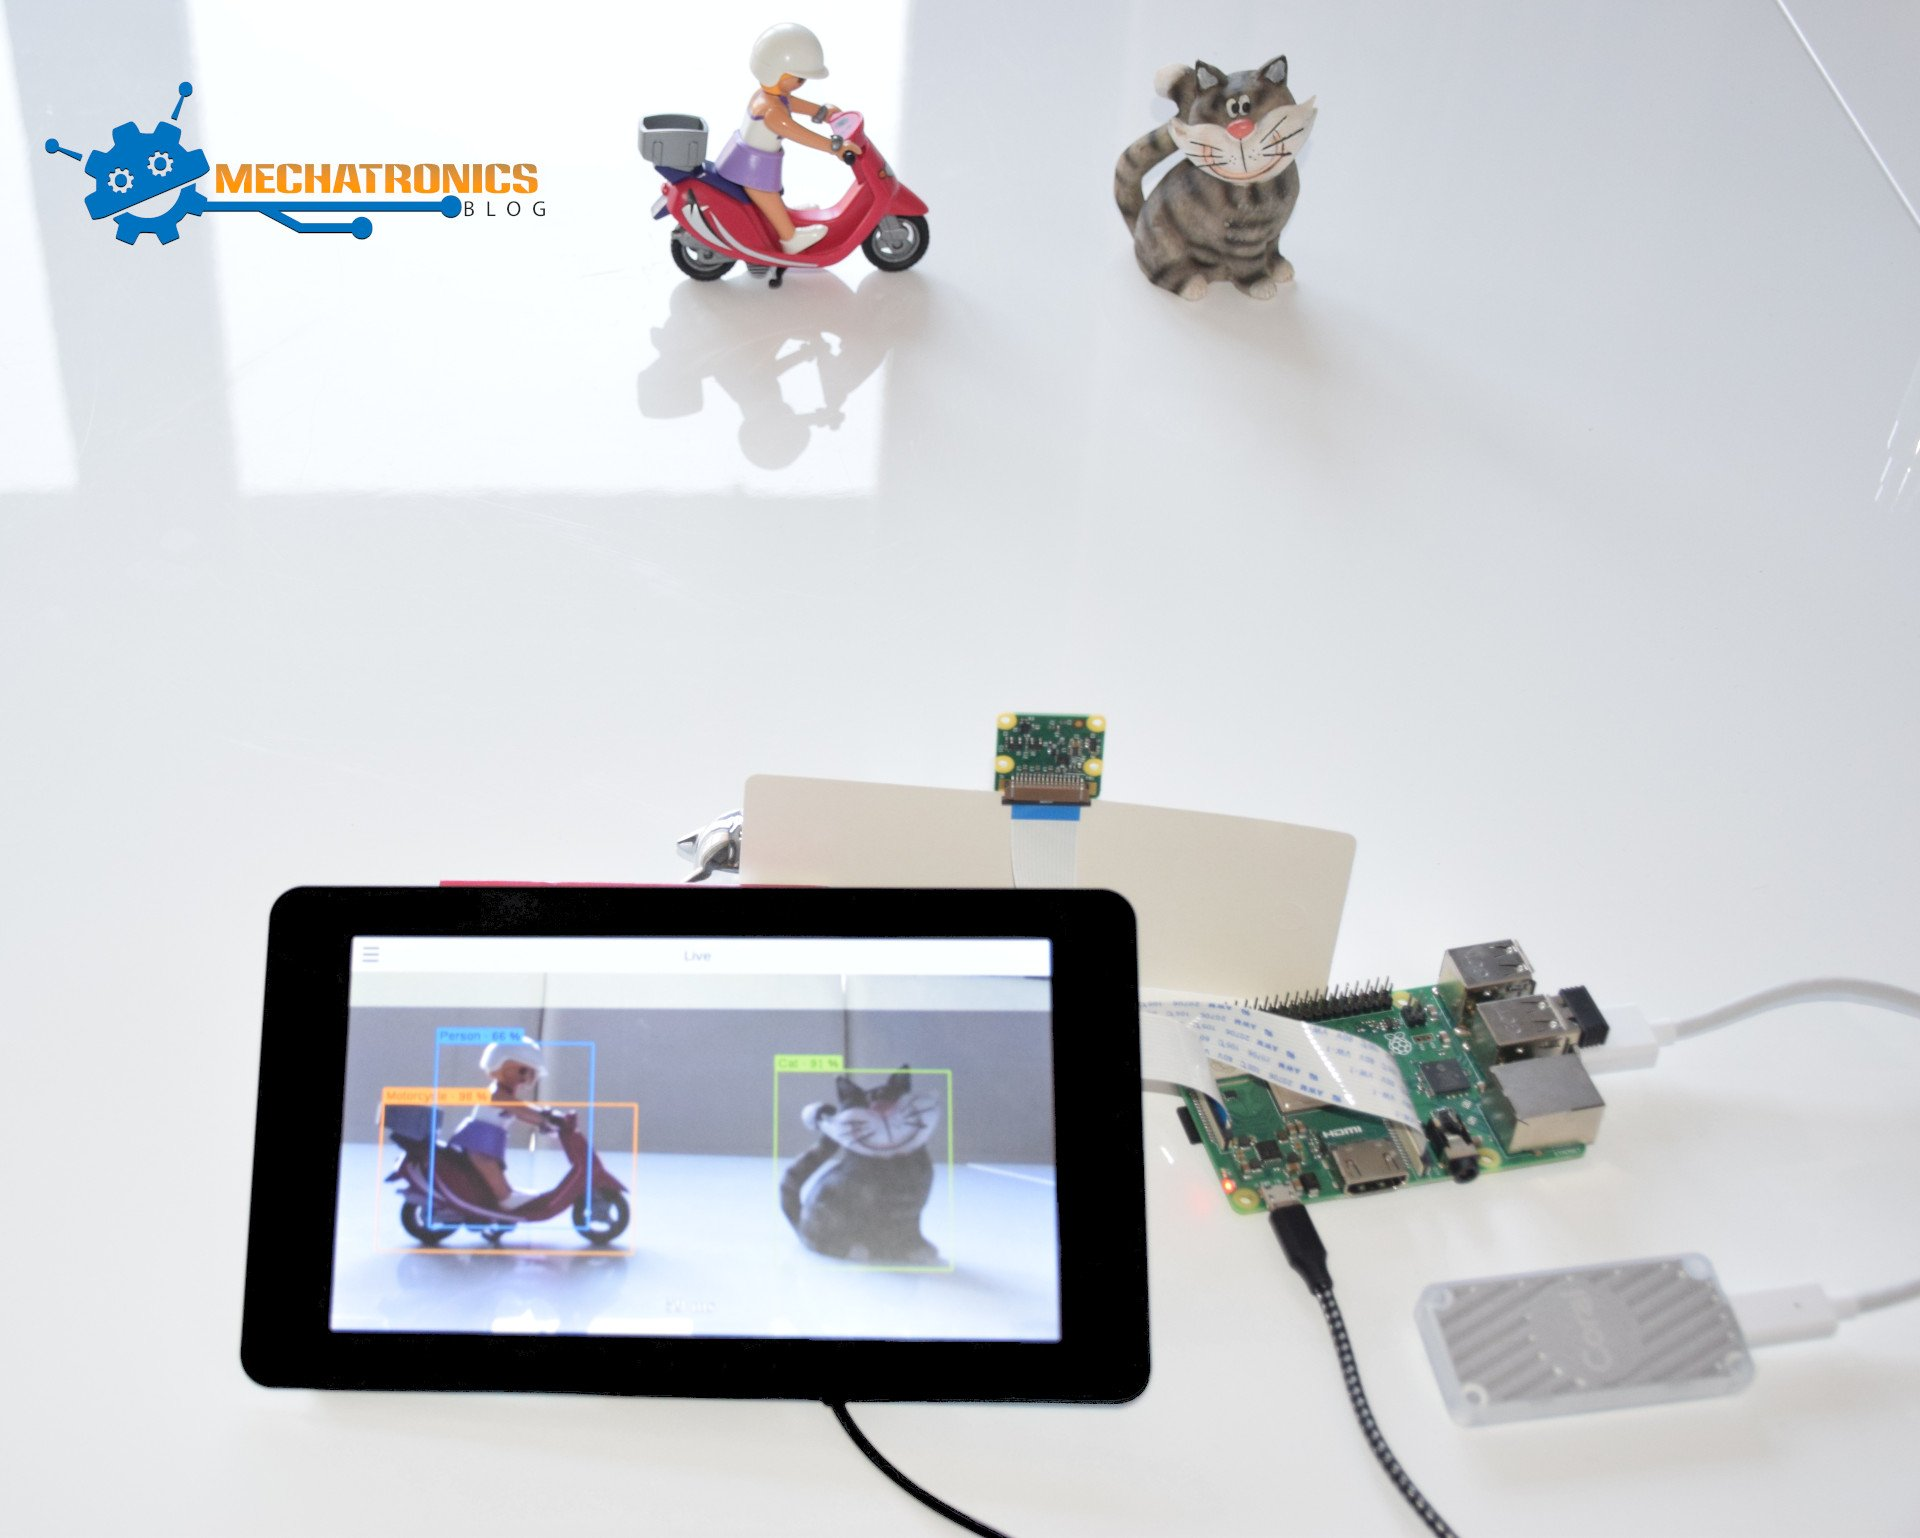 Coral USB Accelerator, TensorFlow Lite C++ API & Raspberry Pi for Edge TPU object detection